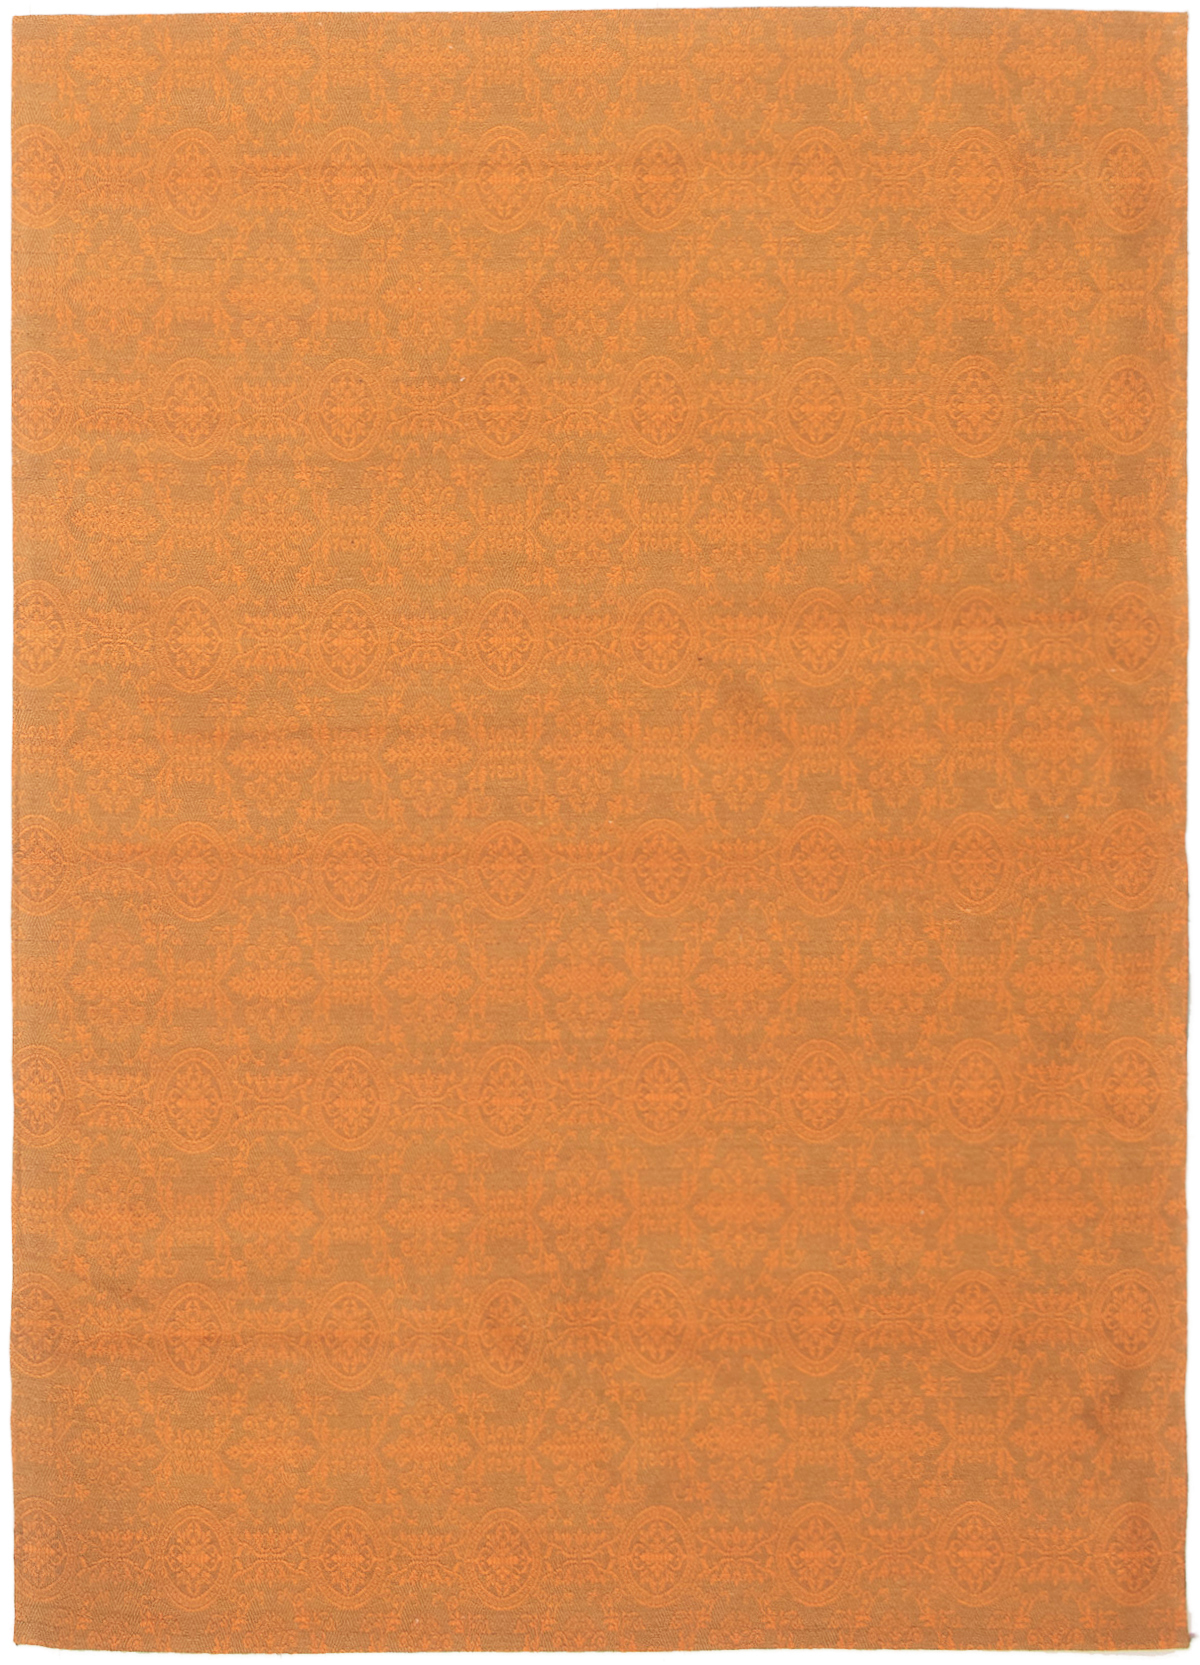 "Handmade Collage Burnt Orange Chenille Rug 4'9"" x 6'9""  Size: 4'9"" x 6'9"""